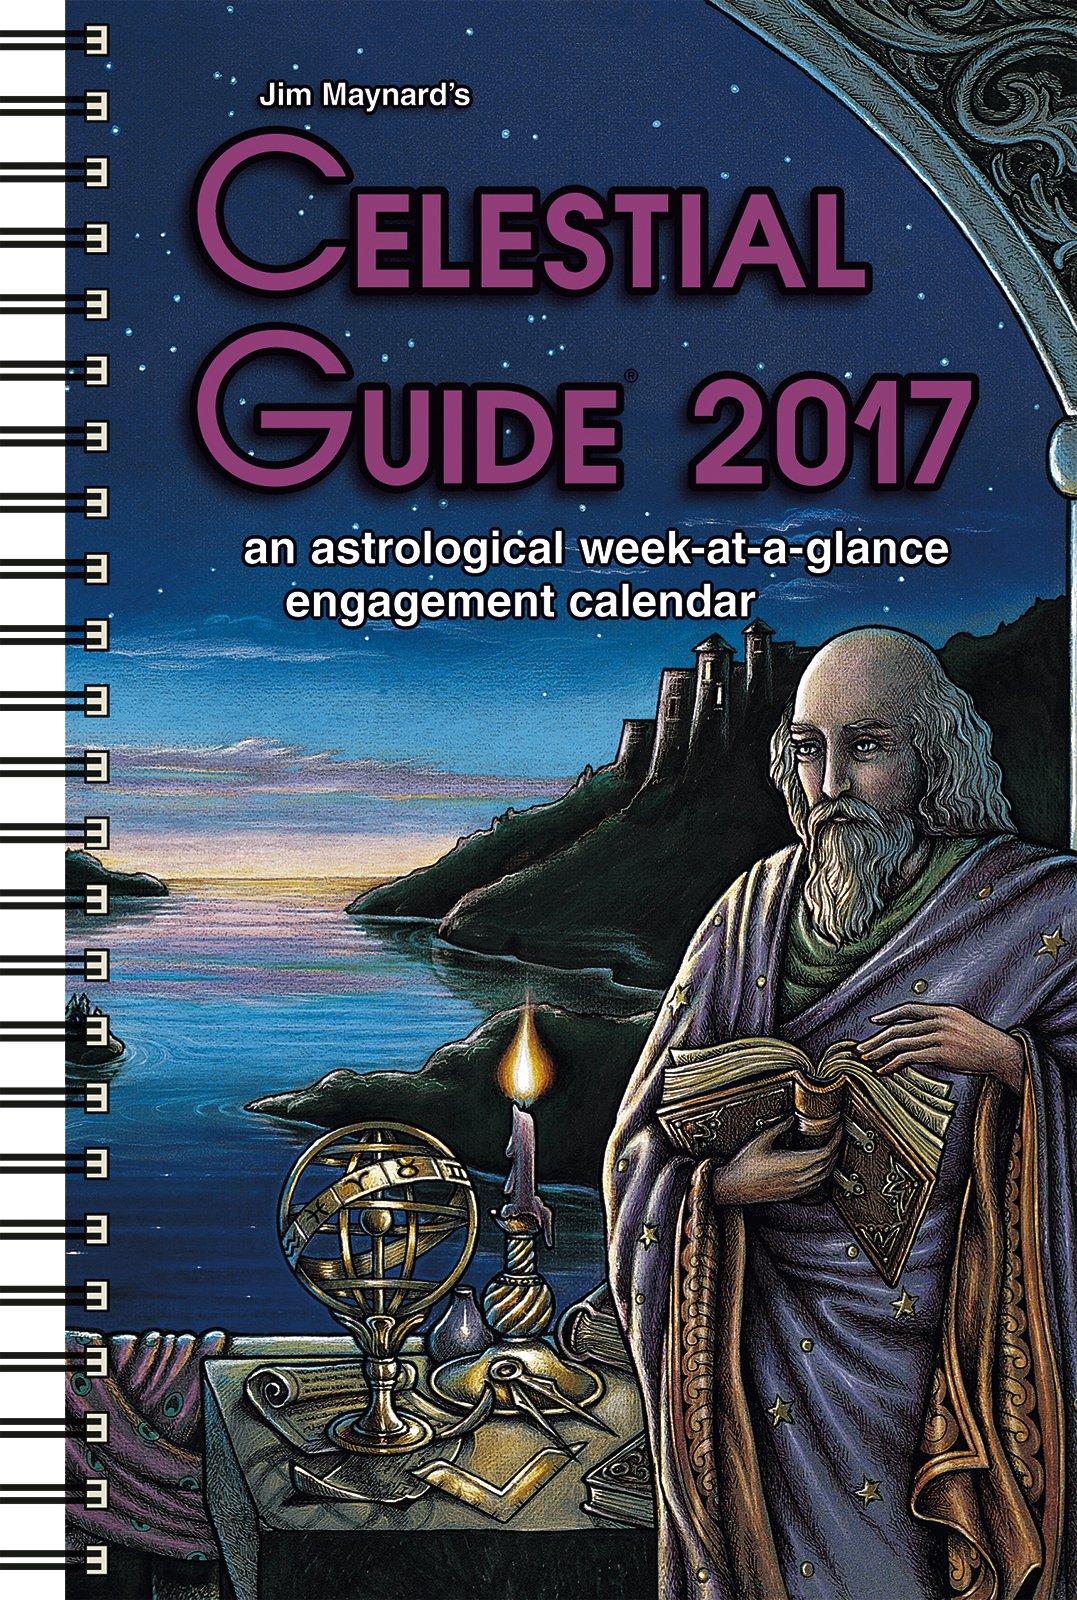 Celestial Guide 2017: Joanne Dosé, Jim Maynard: 9781935482468 ...